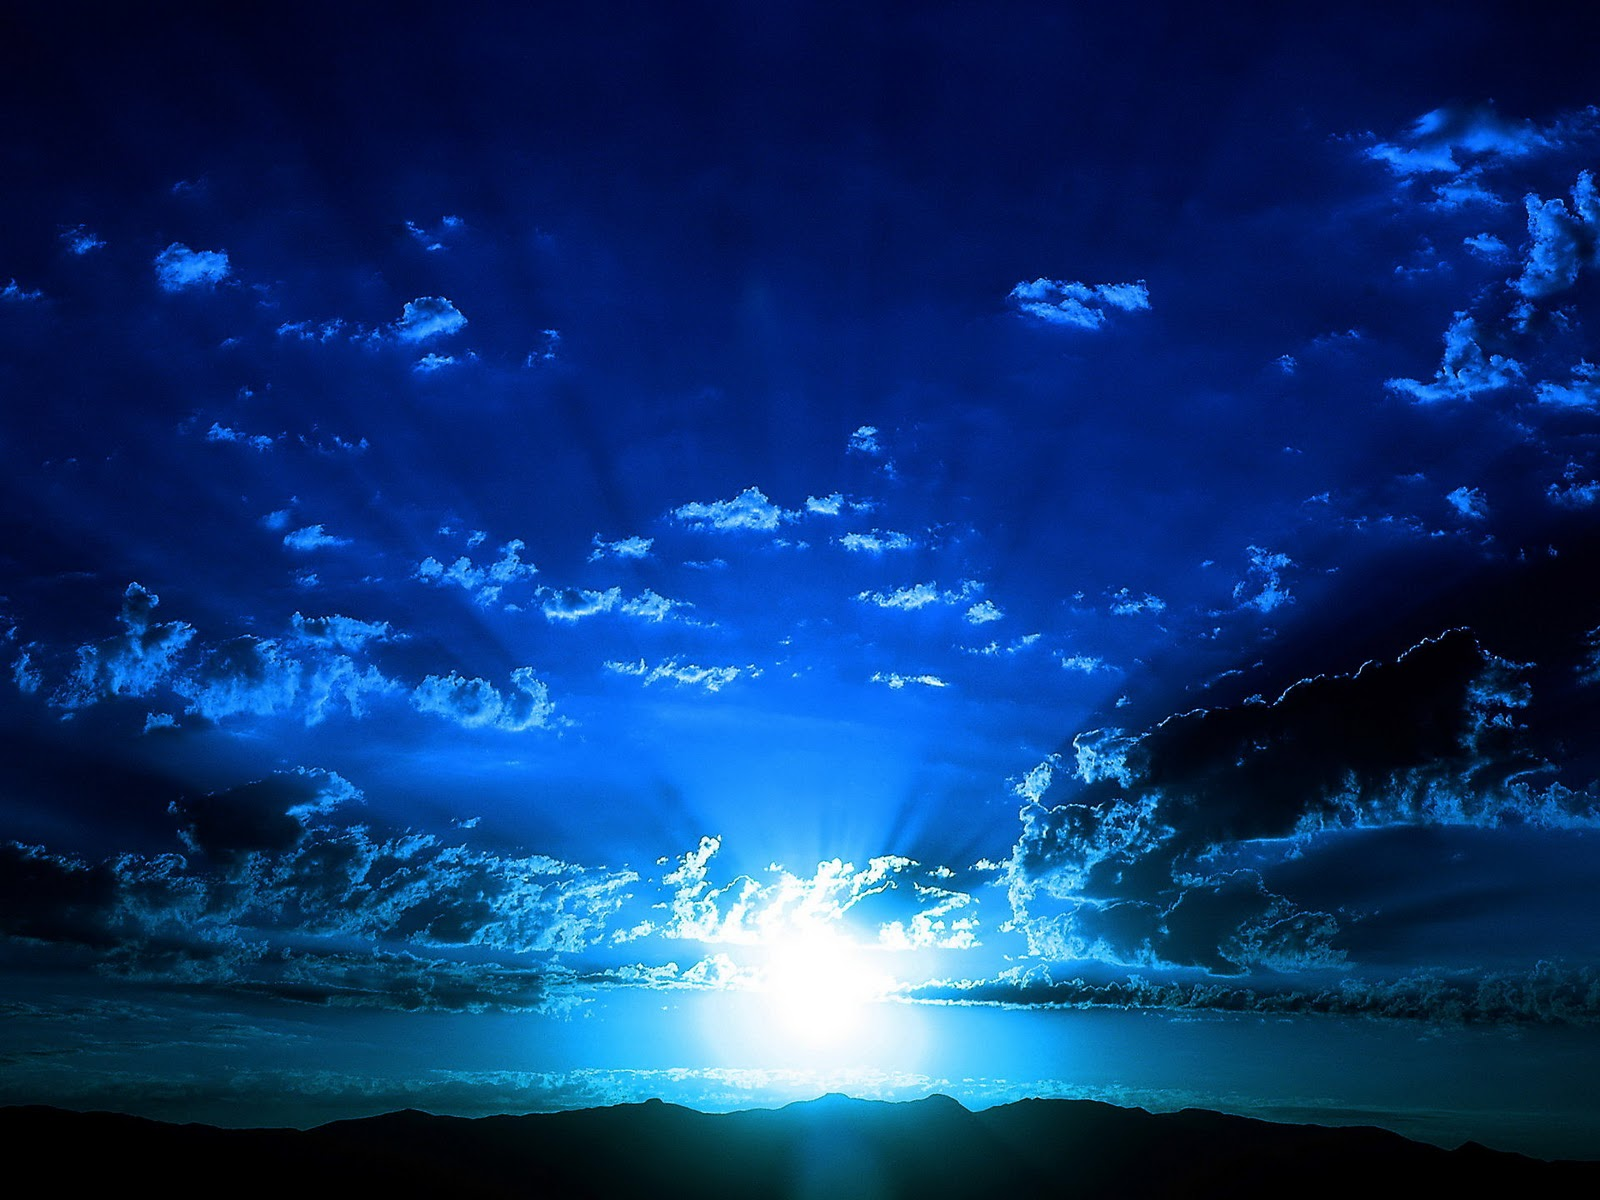 Dark Blue Sky Background: Incredible Dark Blue Sky HD Wallpaper